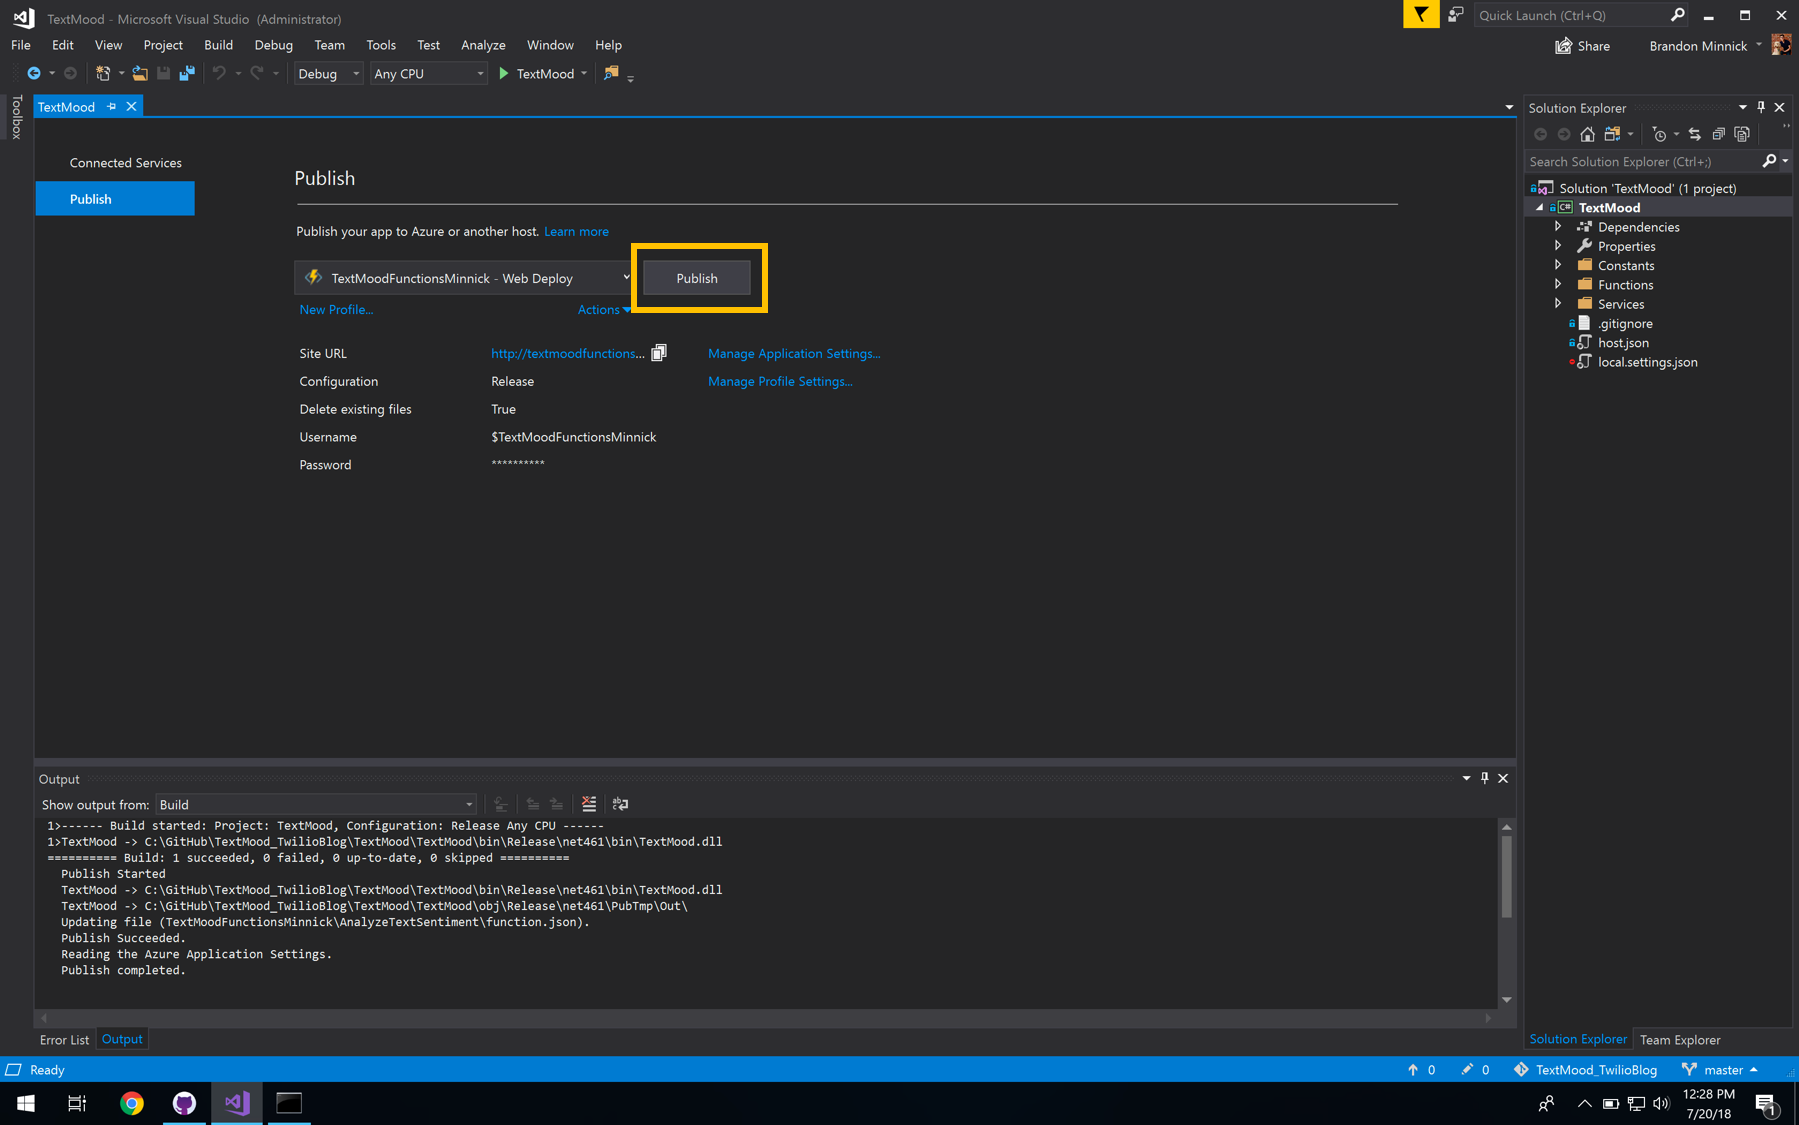 Azure Functions Publish